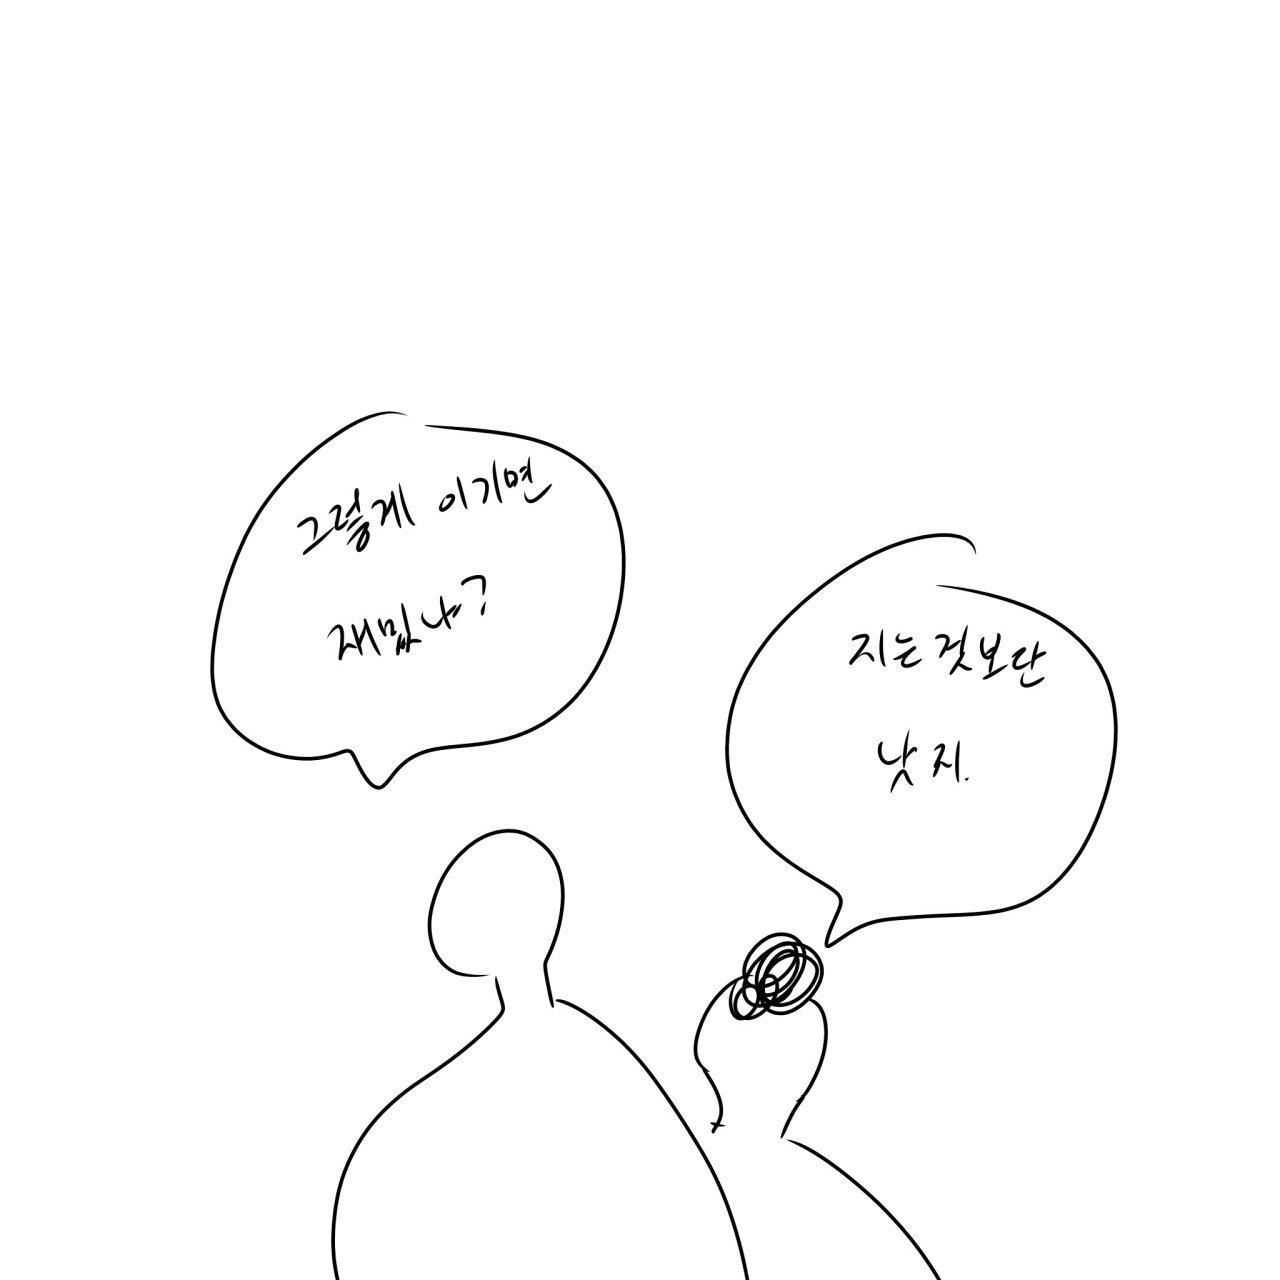 cartoon-20190528-184810-019.jpg 포켓몬 테러리스트 만화.manwha 포켓몬 극한의 효율충...MANHWA